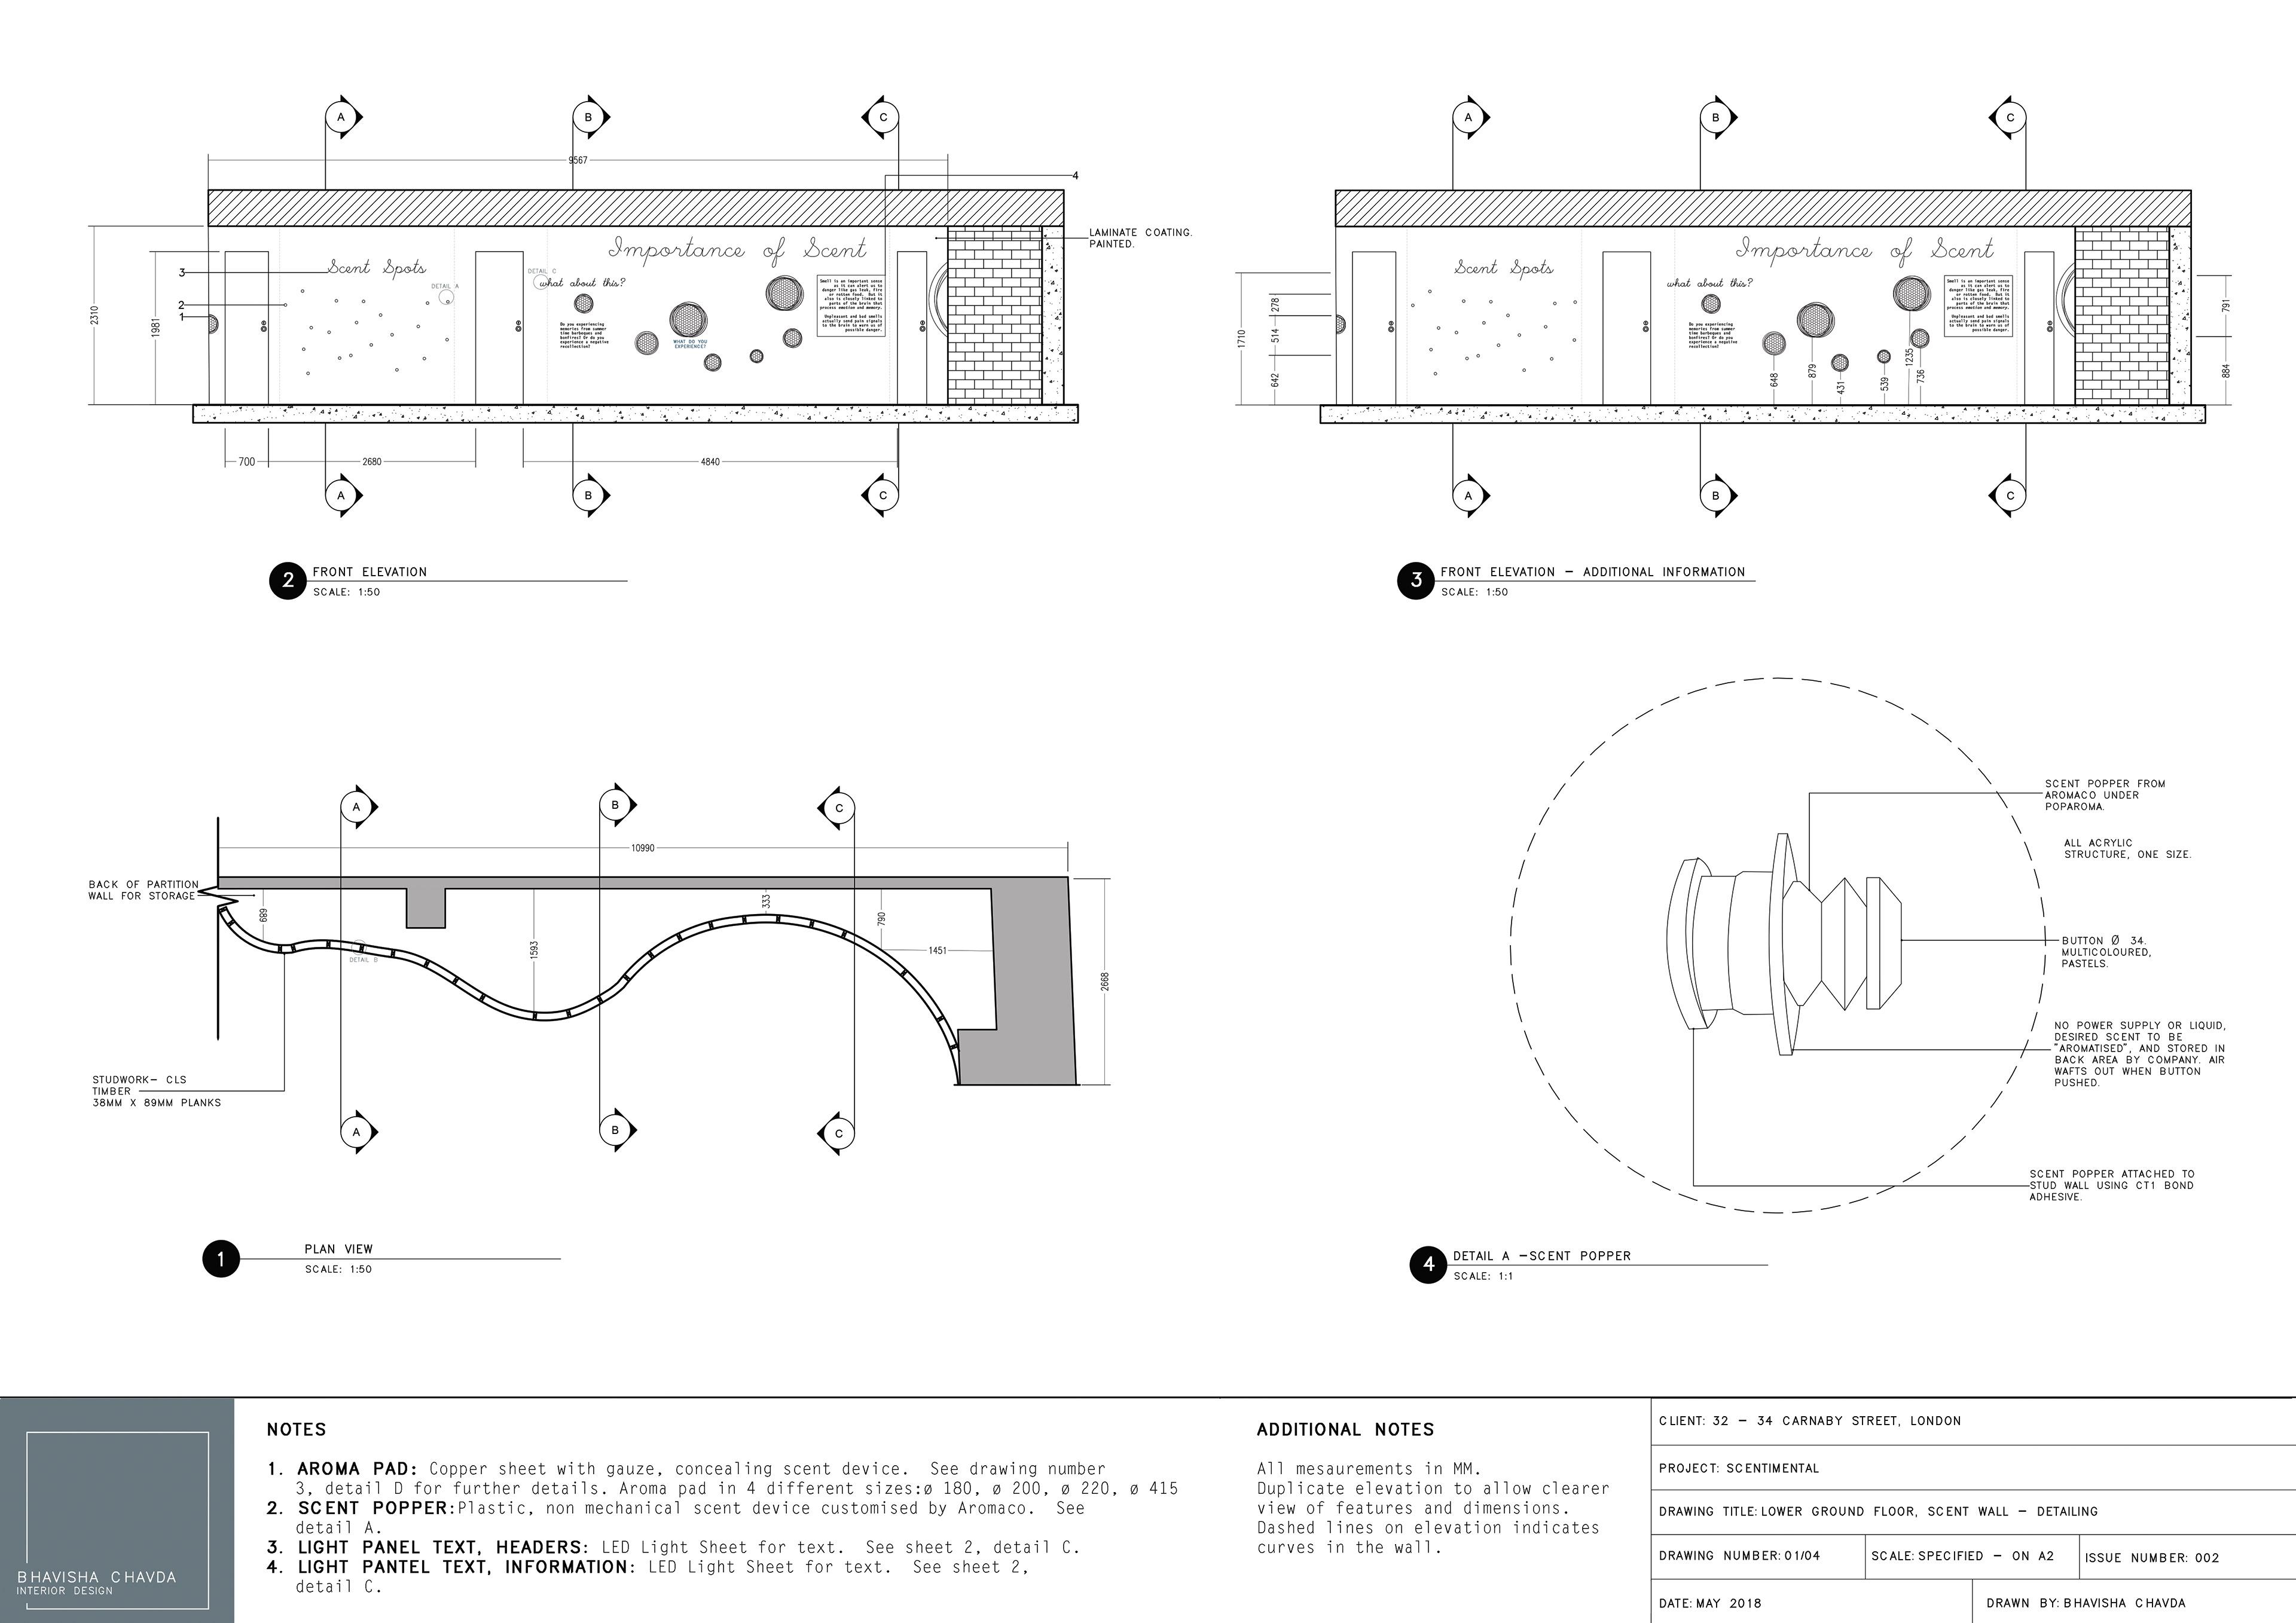 bhavisha chavda technical drawings and models